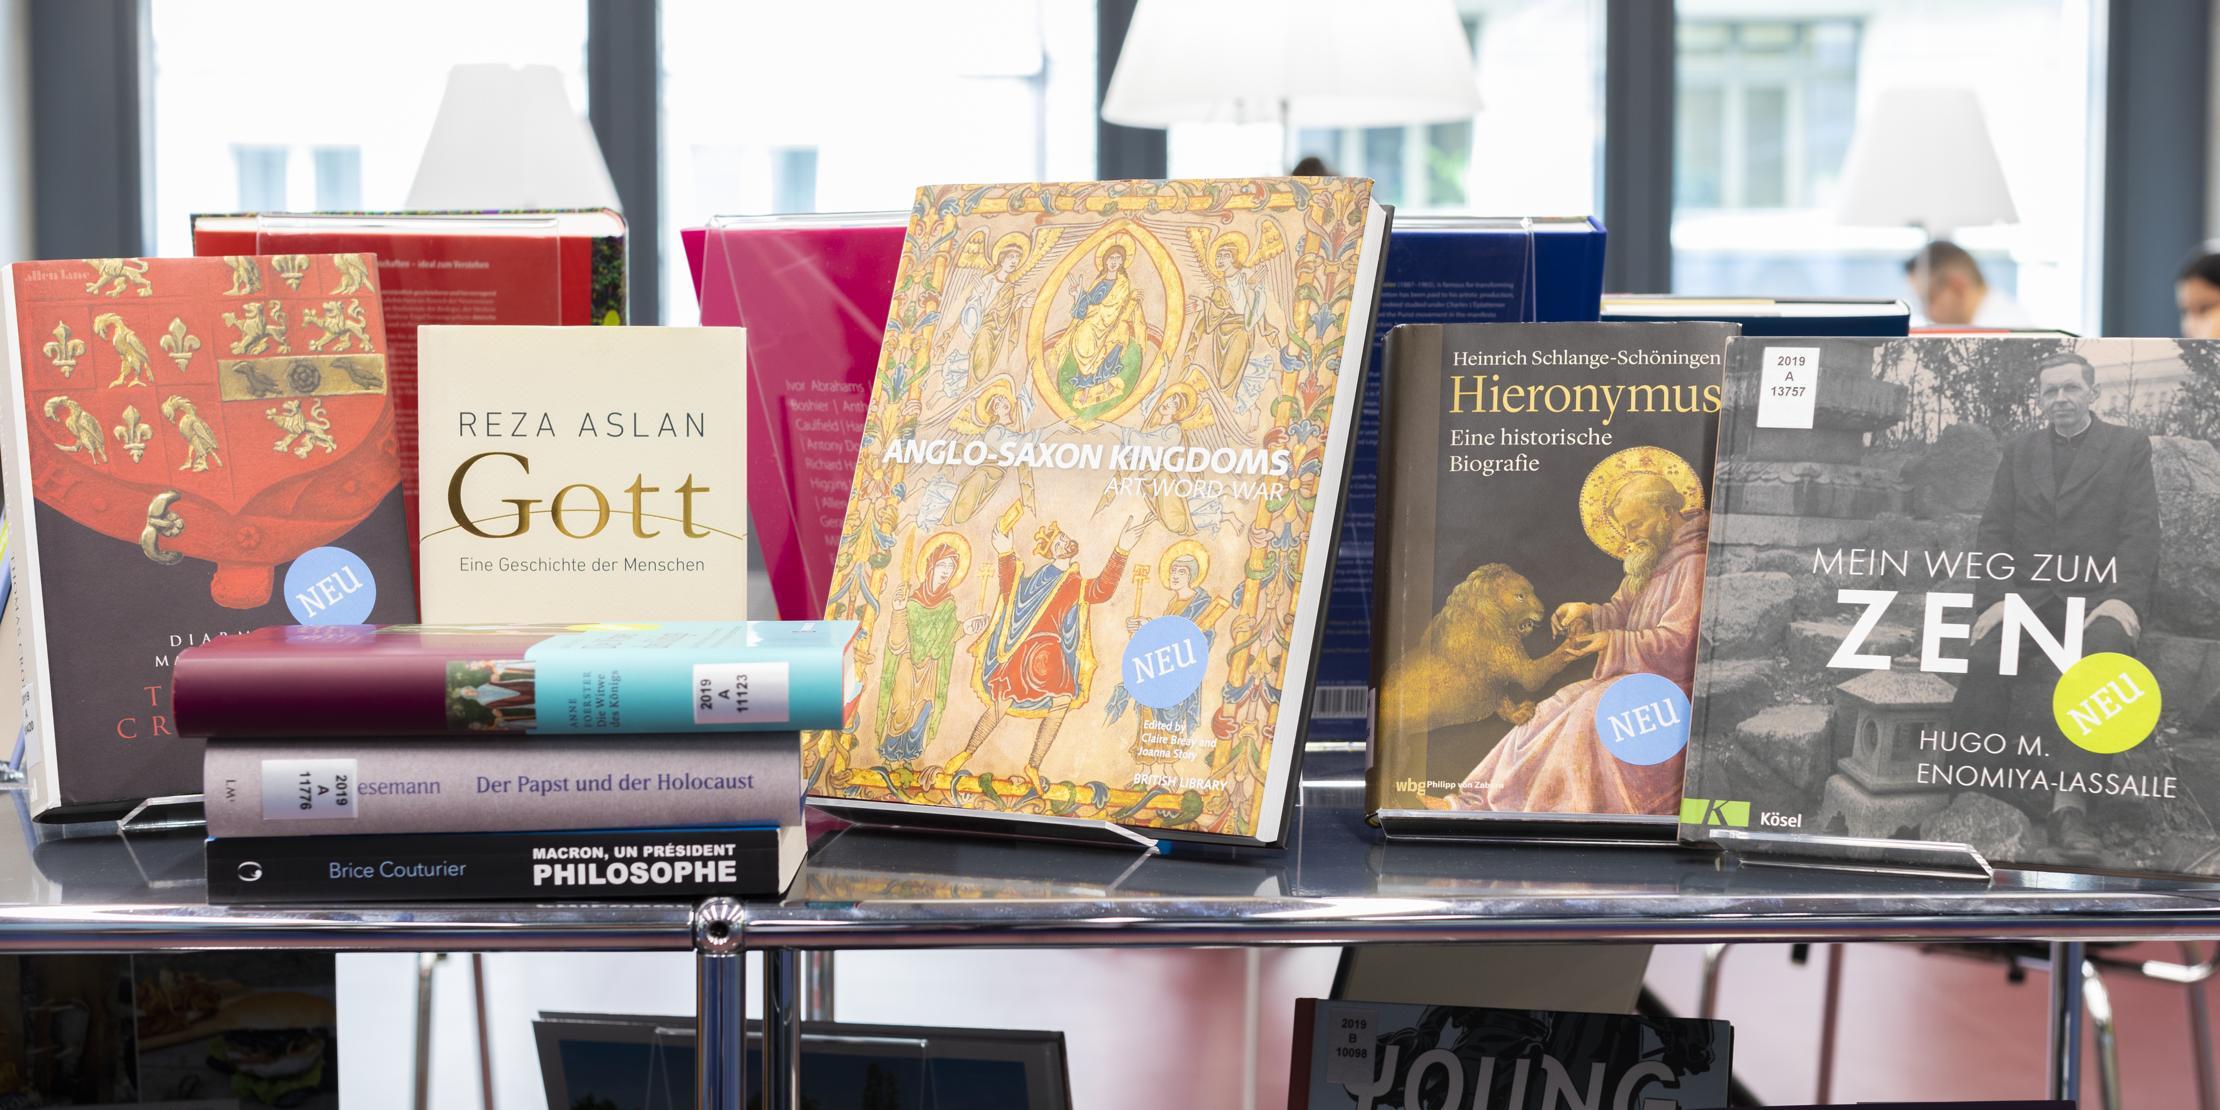 Geschichte, Philosophie, Religion, Kultur